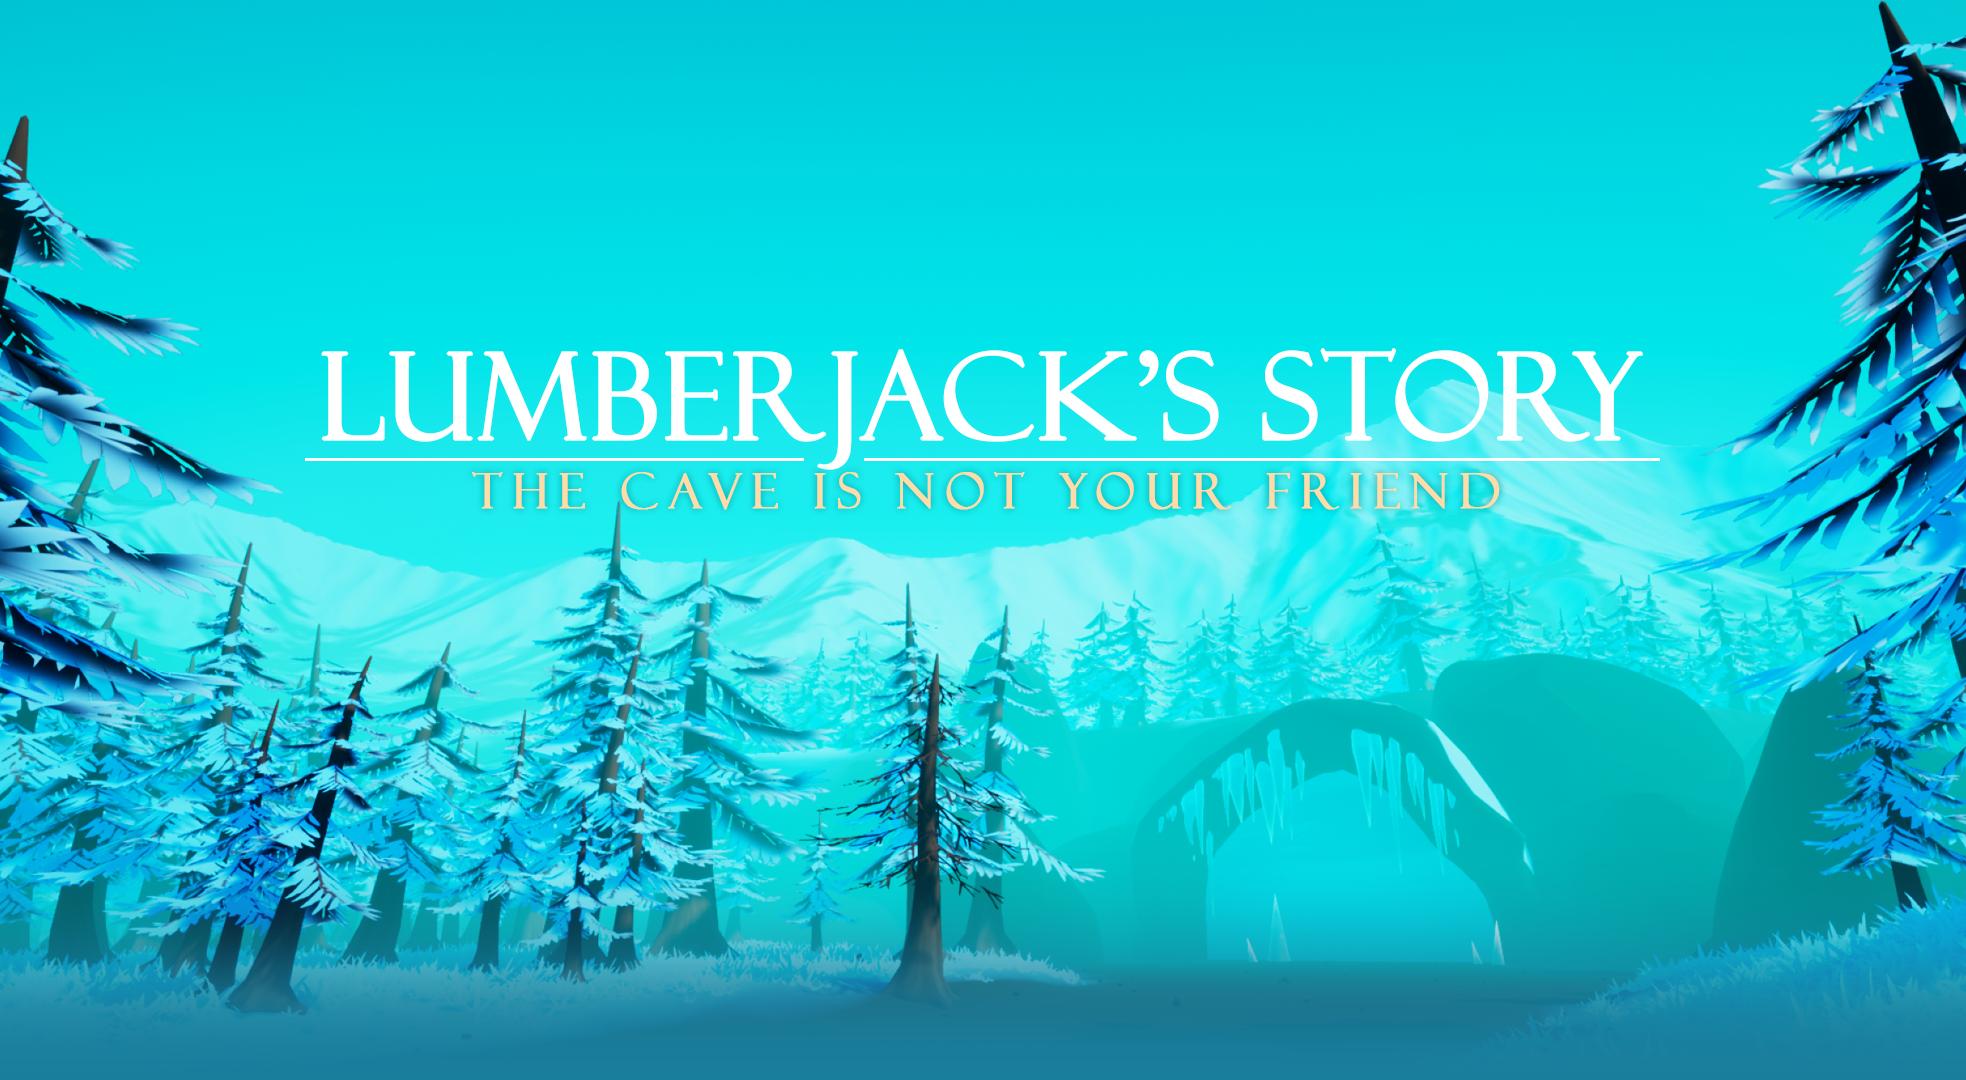 Lumberjack's Story